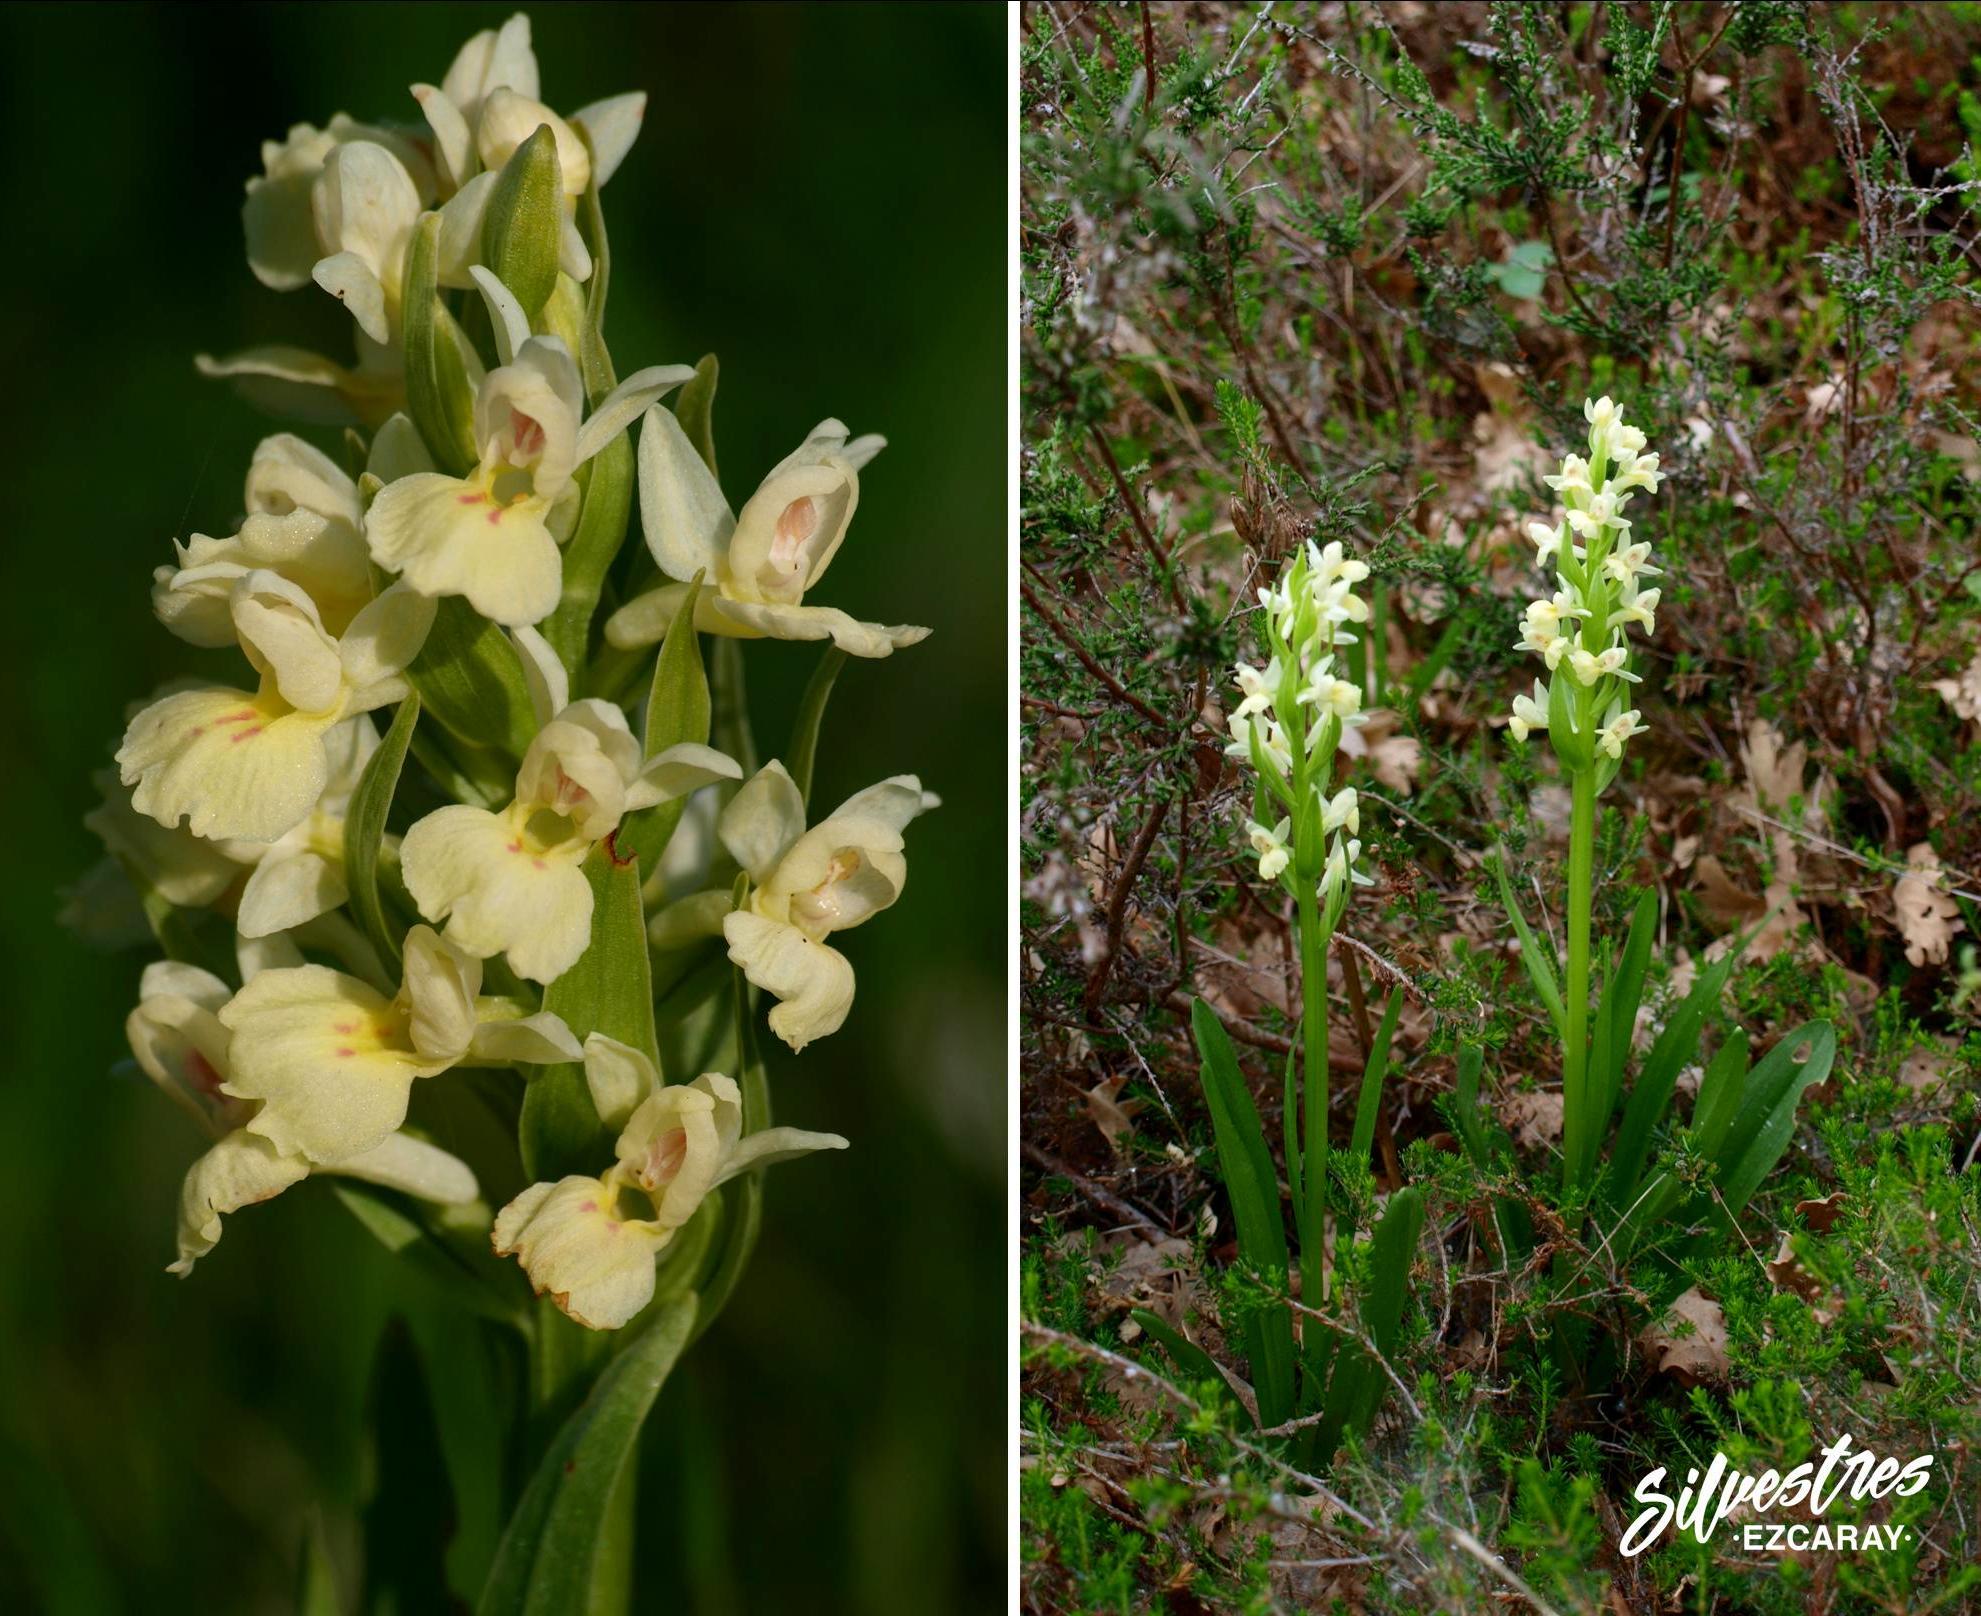 Dactylorhiza_insularis_ezcaray_la_rioja_catalogo_floristico_citas_botanicas